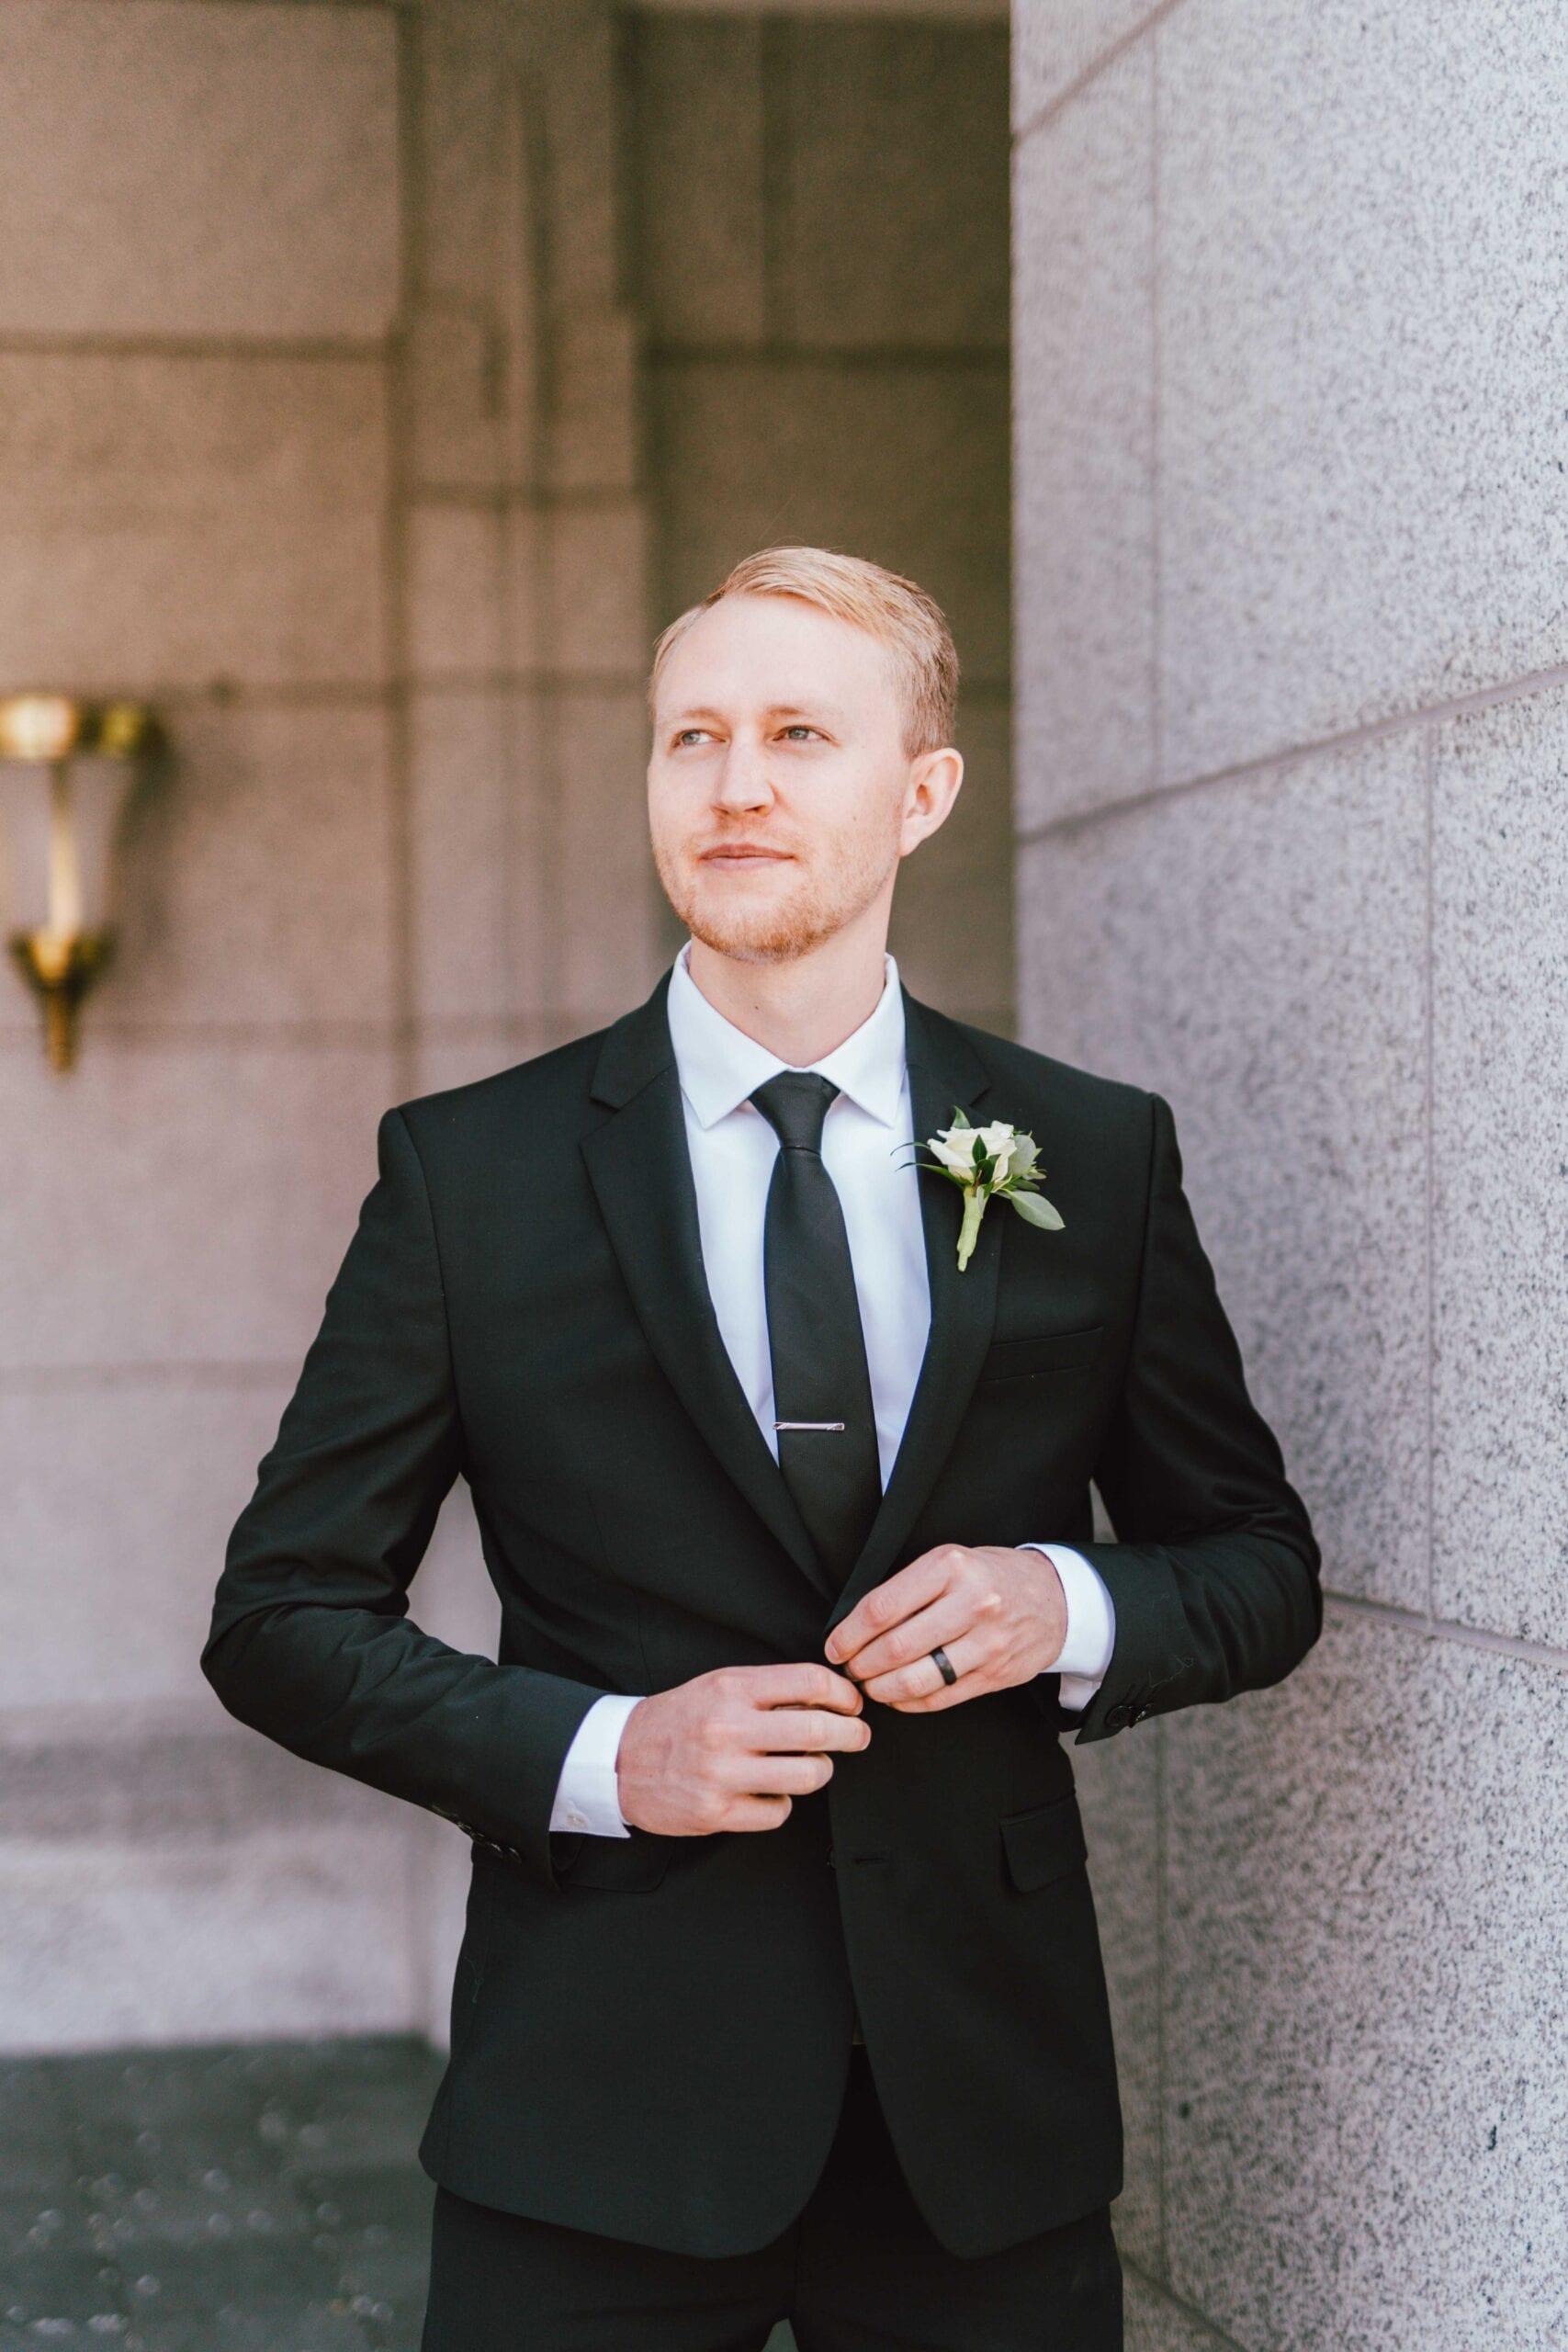 draper utah temple wedding groom